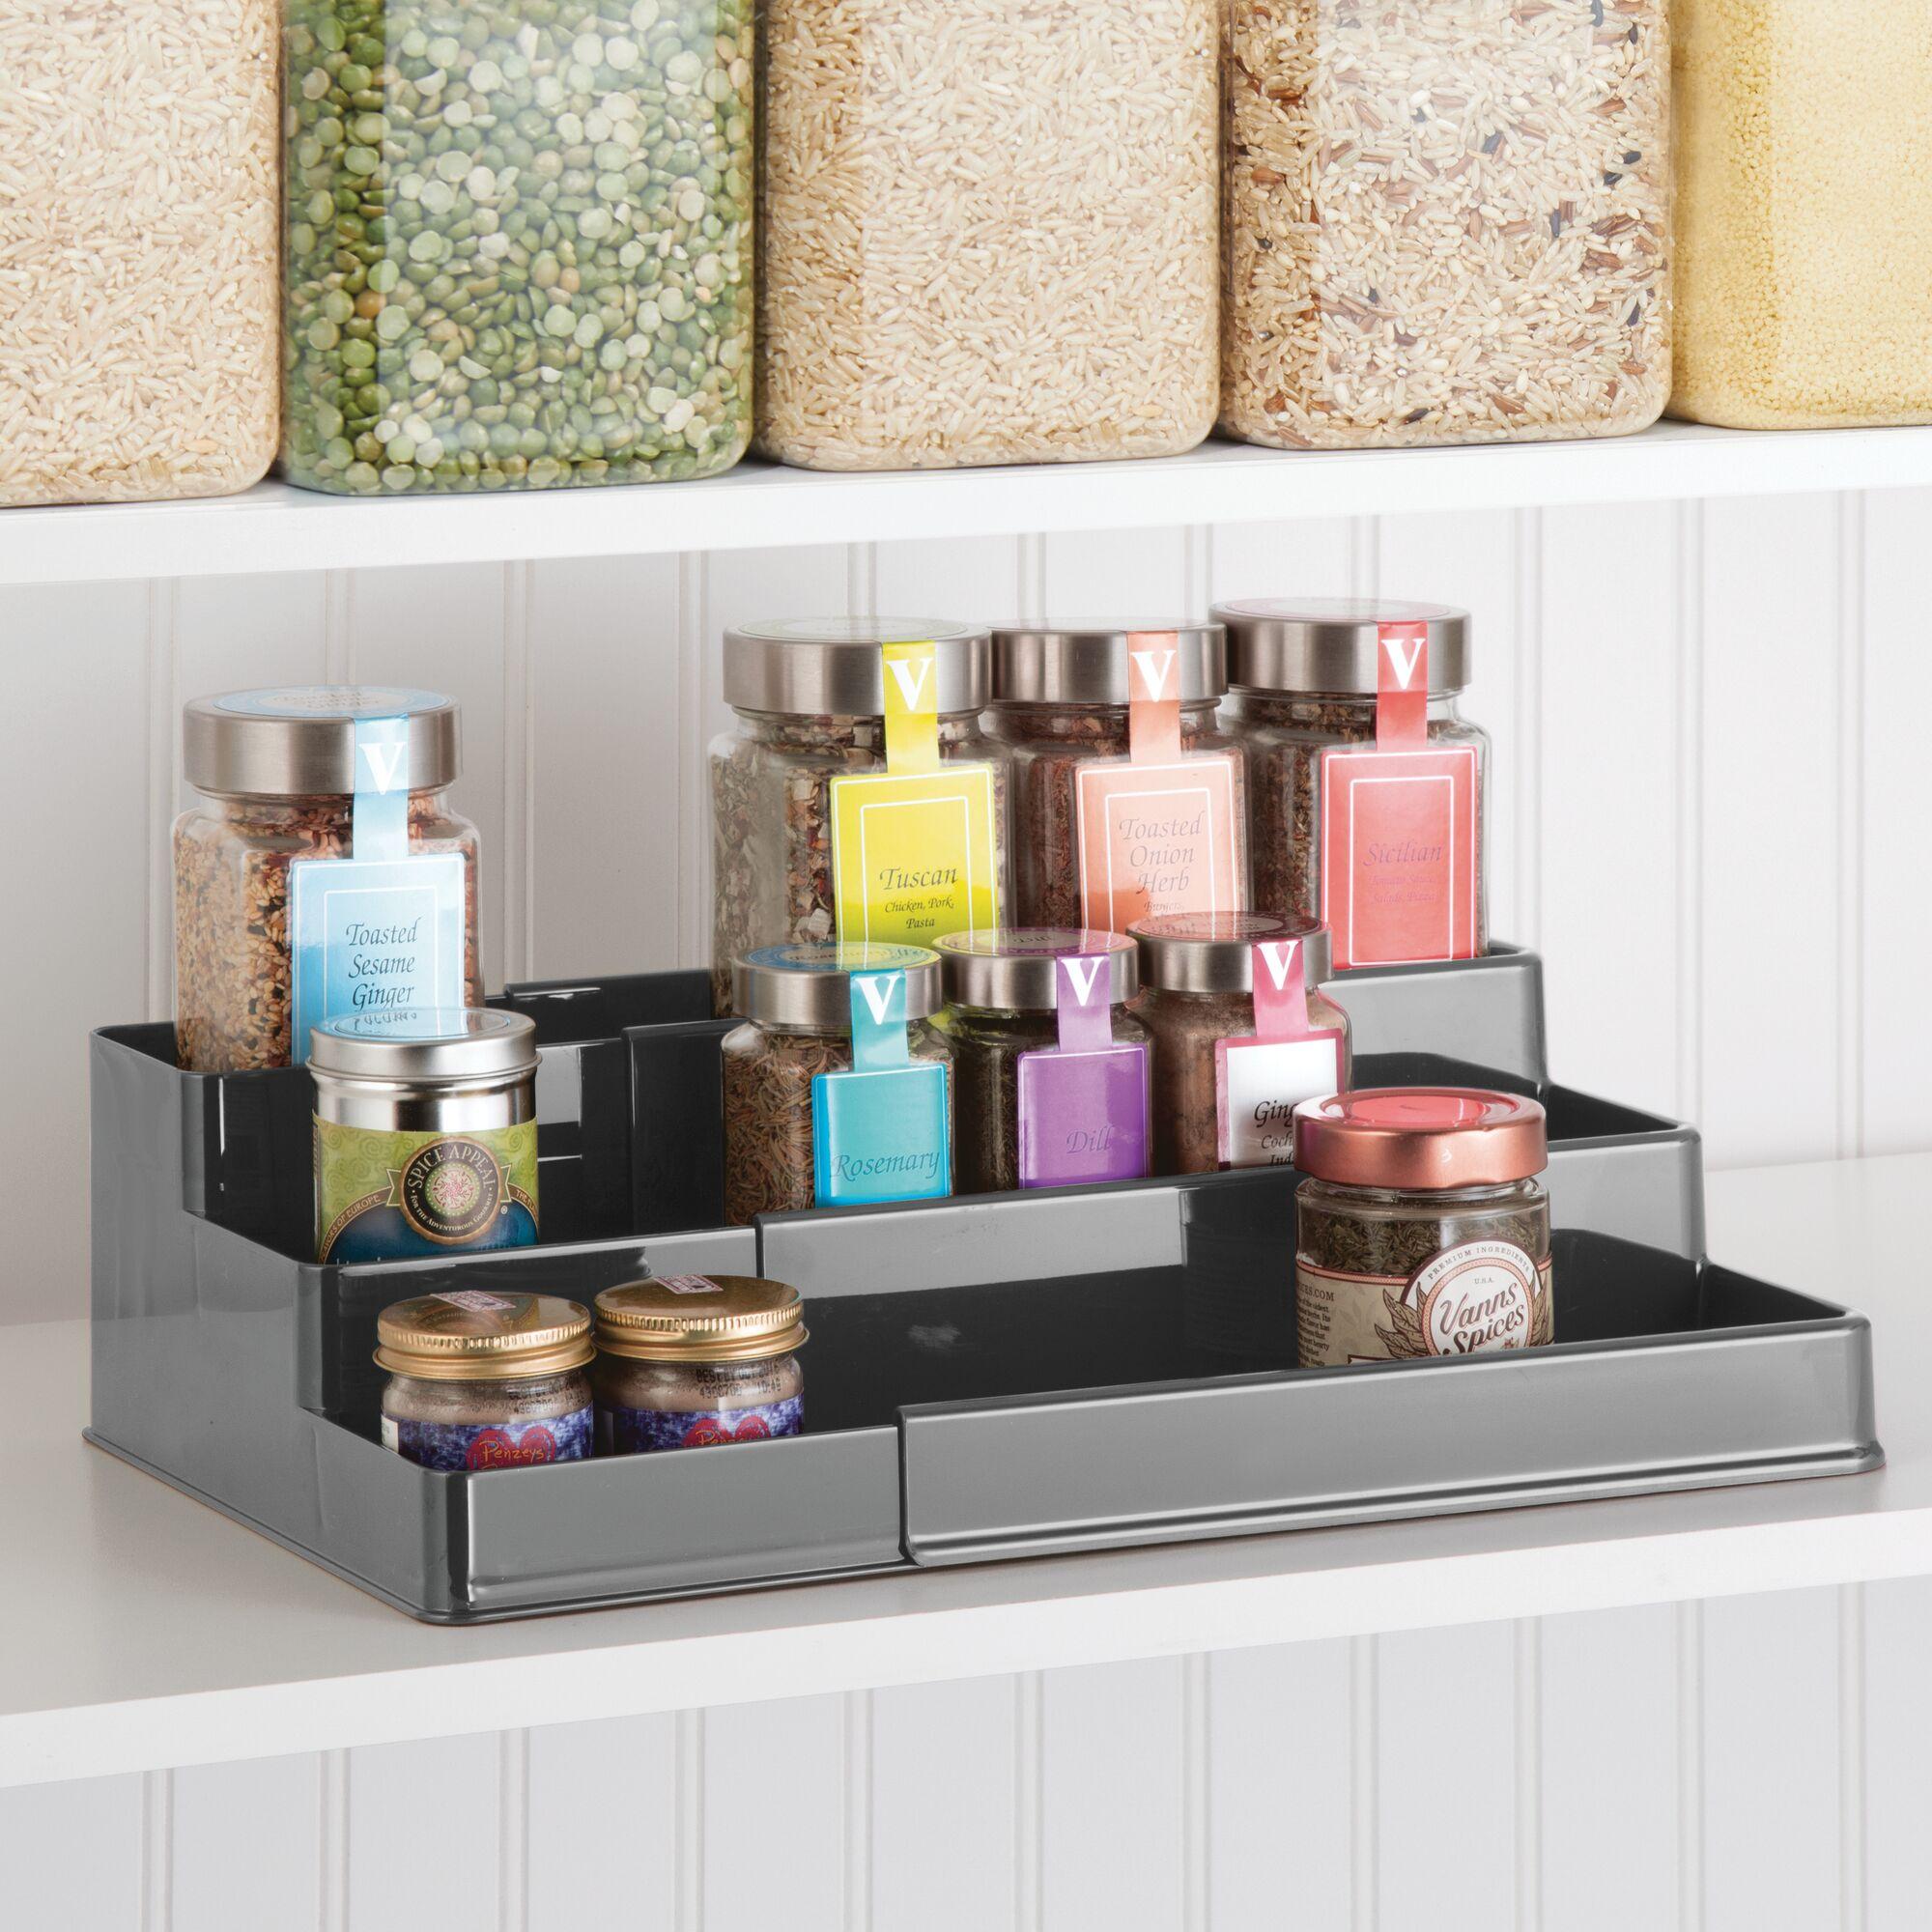 mDesign-Expandable-Kitchen-Cabinet-Pantry-Organizer-Spice-Rack thumbnail 31